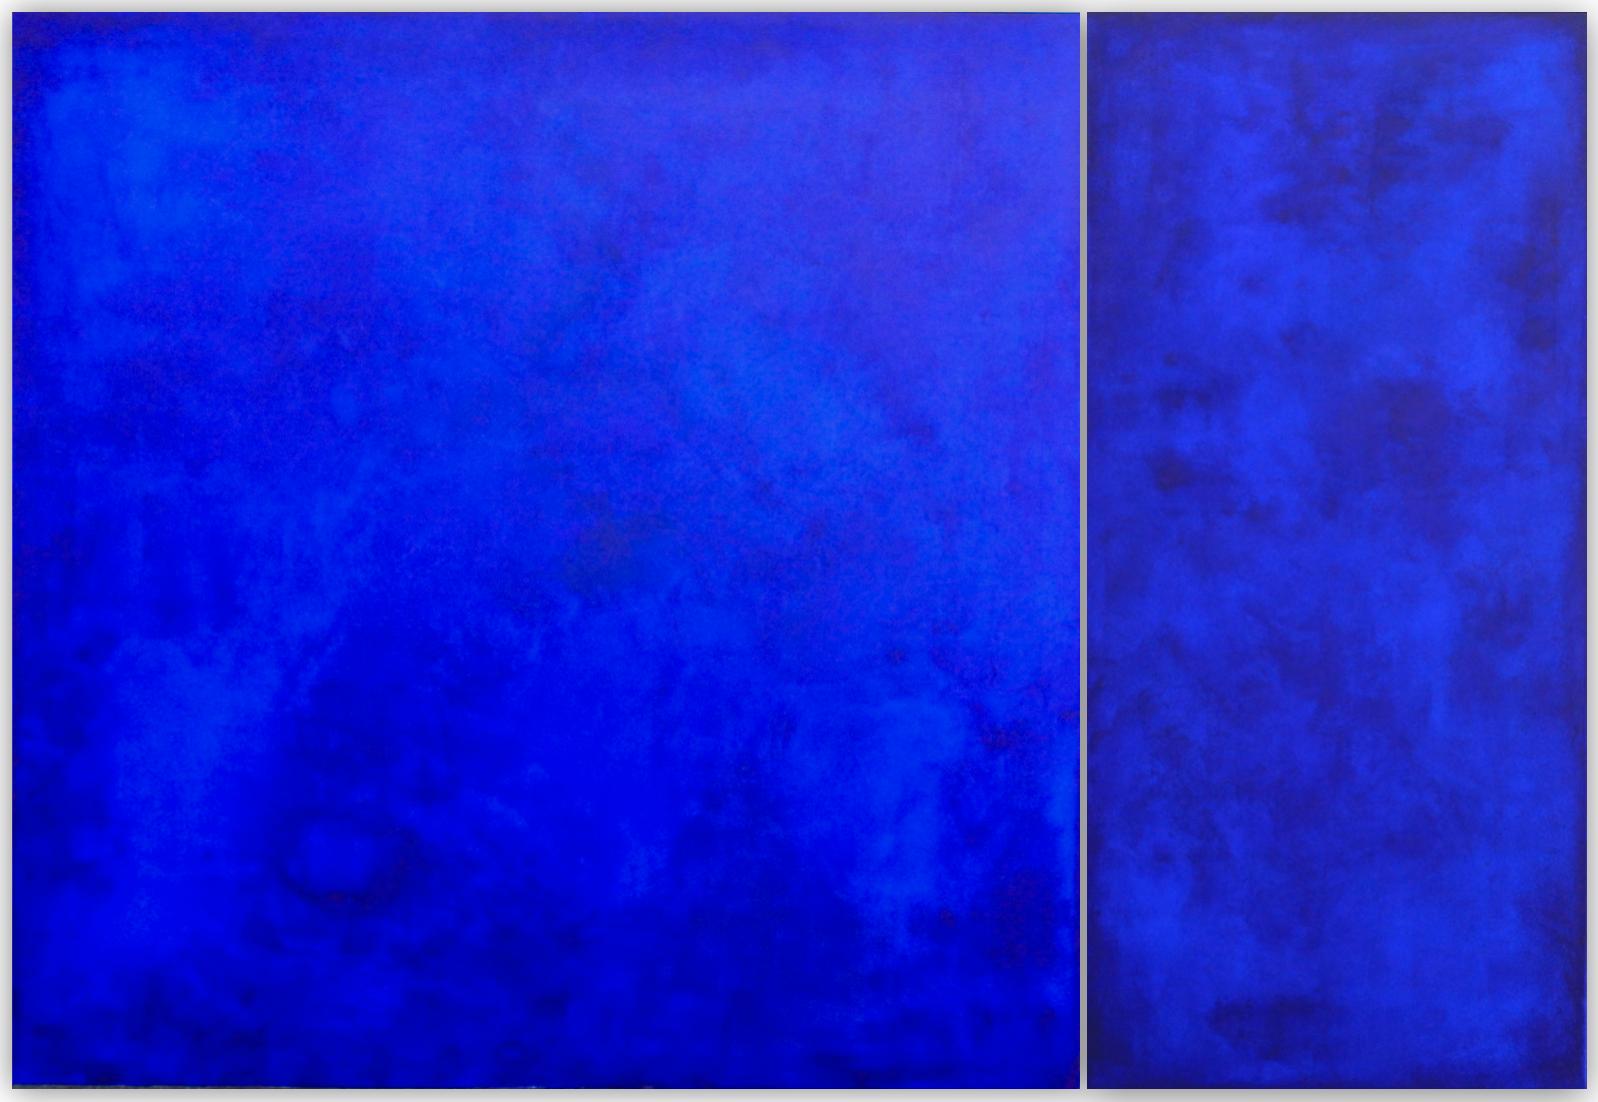 ELECTRIC DREAM - Monochrome acrylic on canvas'.2500mm x 1700mm (Diptique)